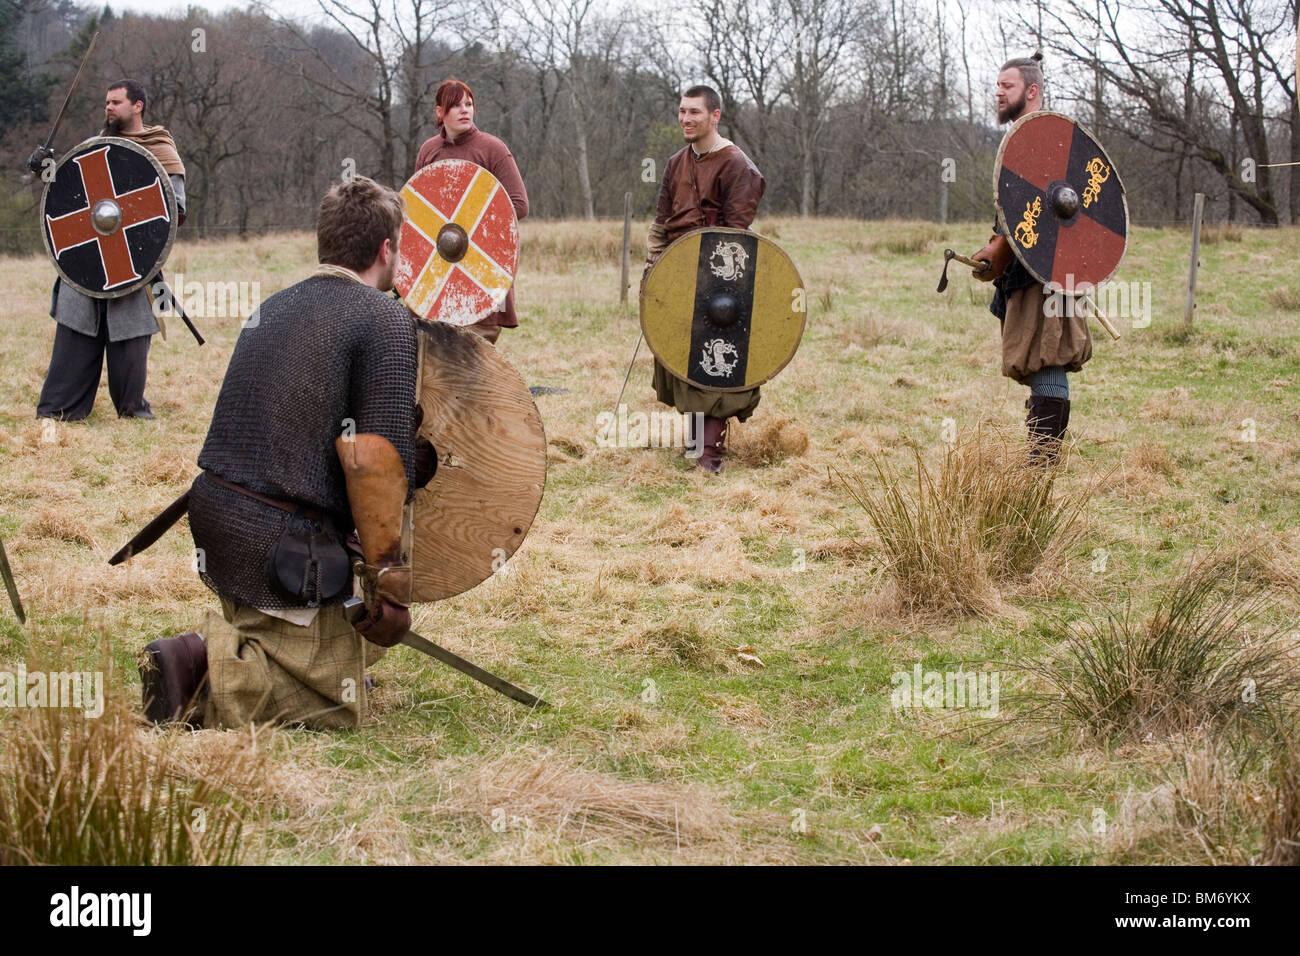 Reenactment. Viking Warriors preparing for battle. Ale Viking Village, Sweden - Stock Image